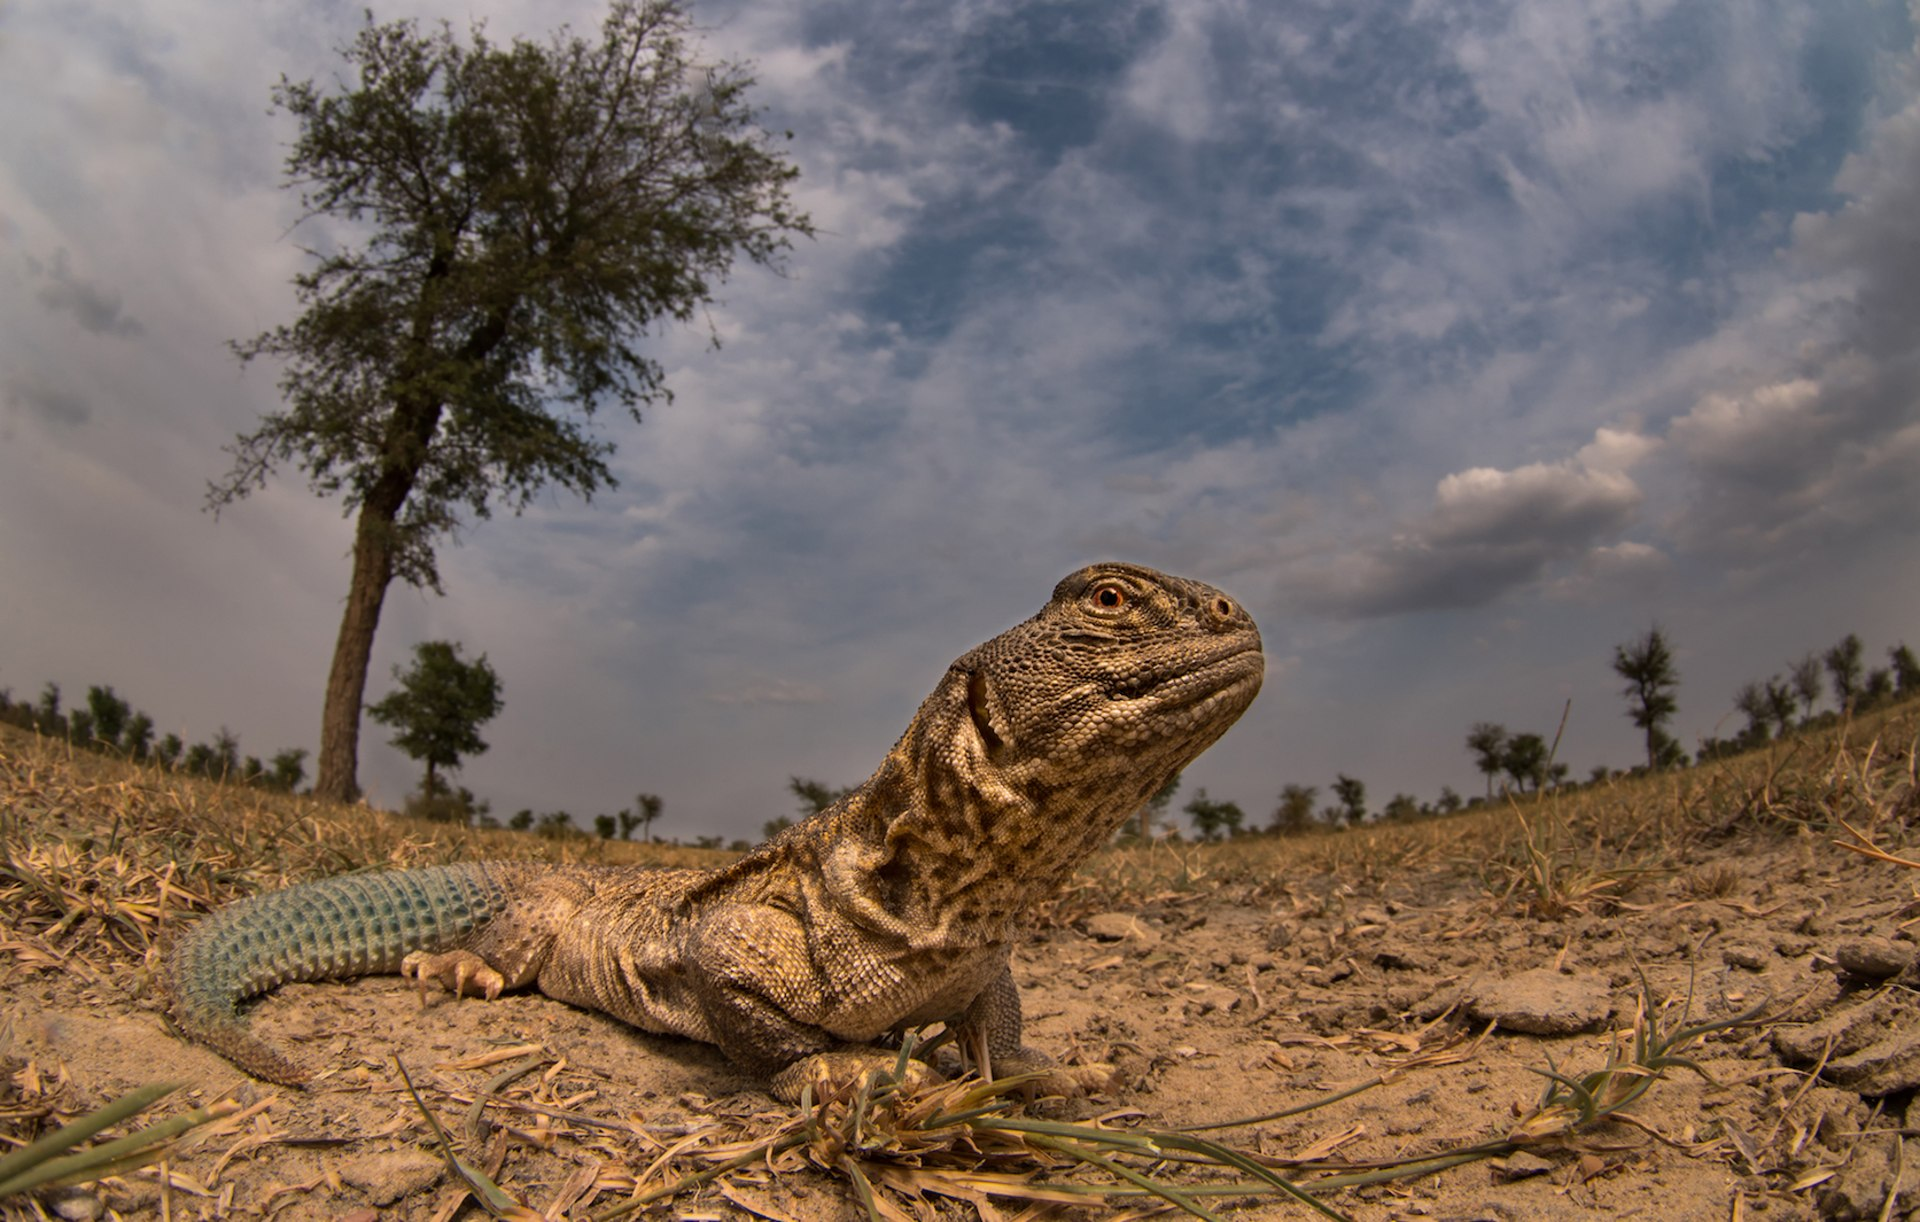 Meet Spiny, the Only Herbivorous Lizard Species in India